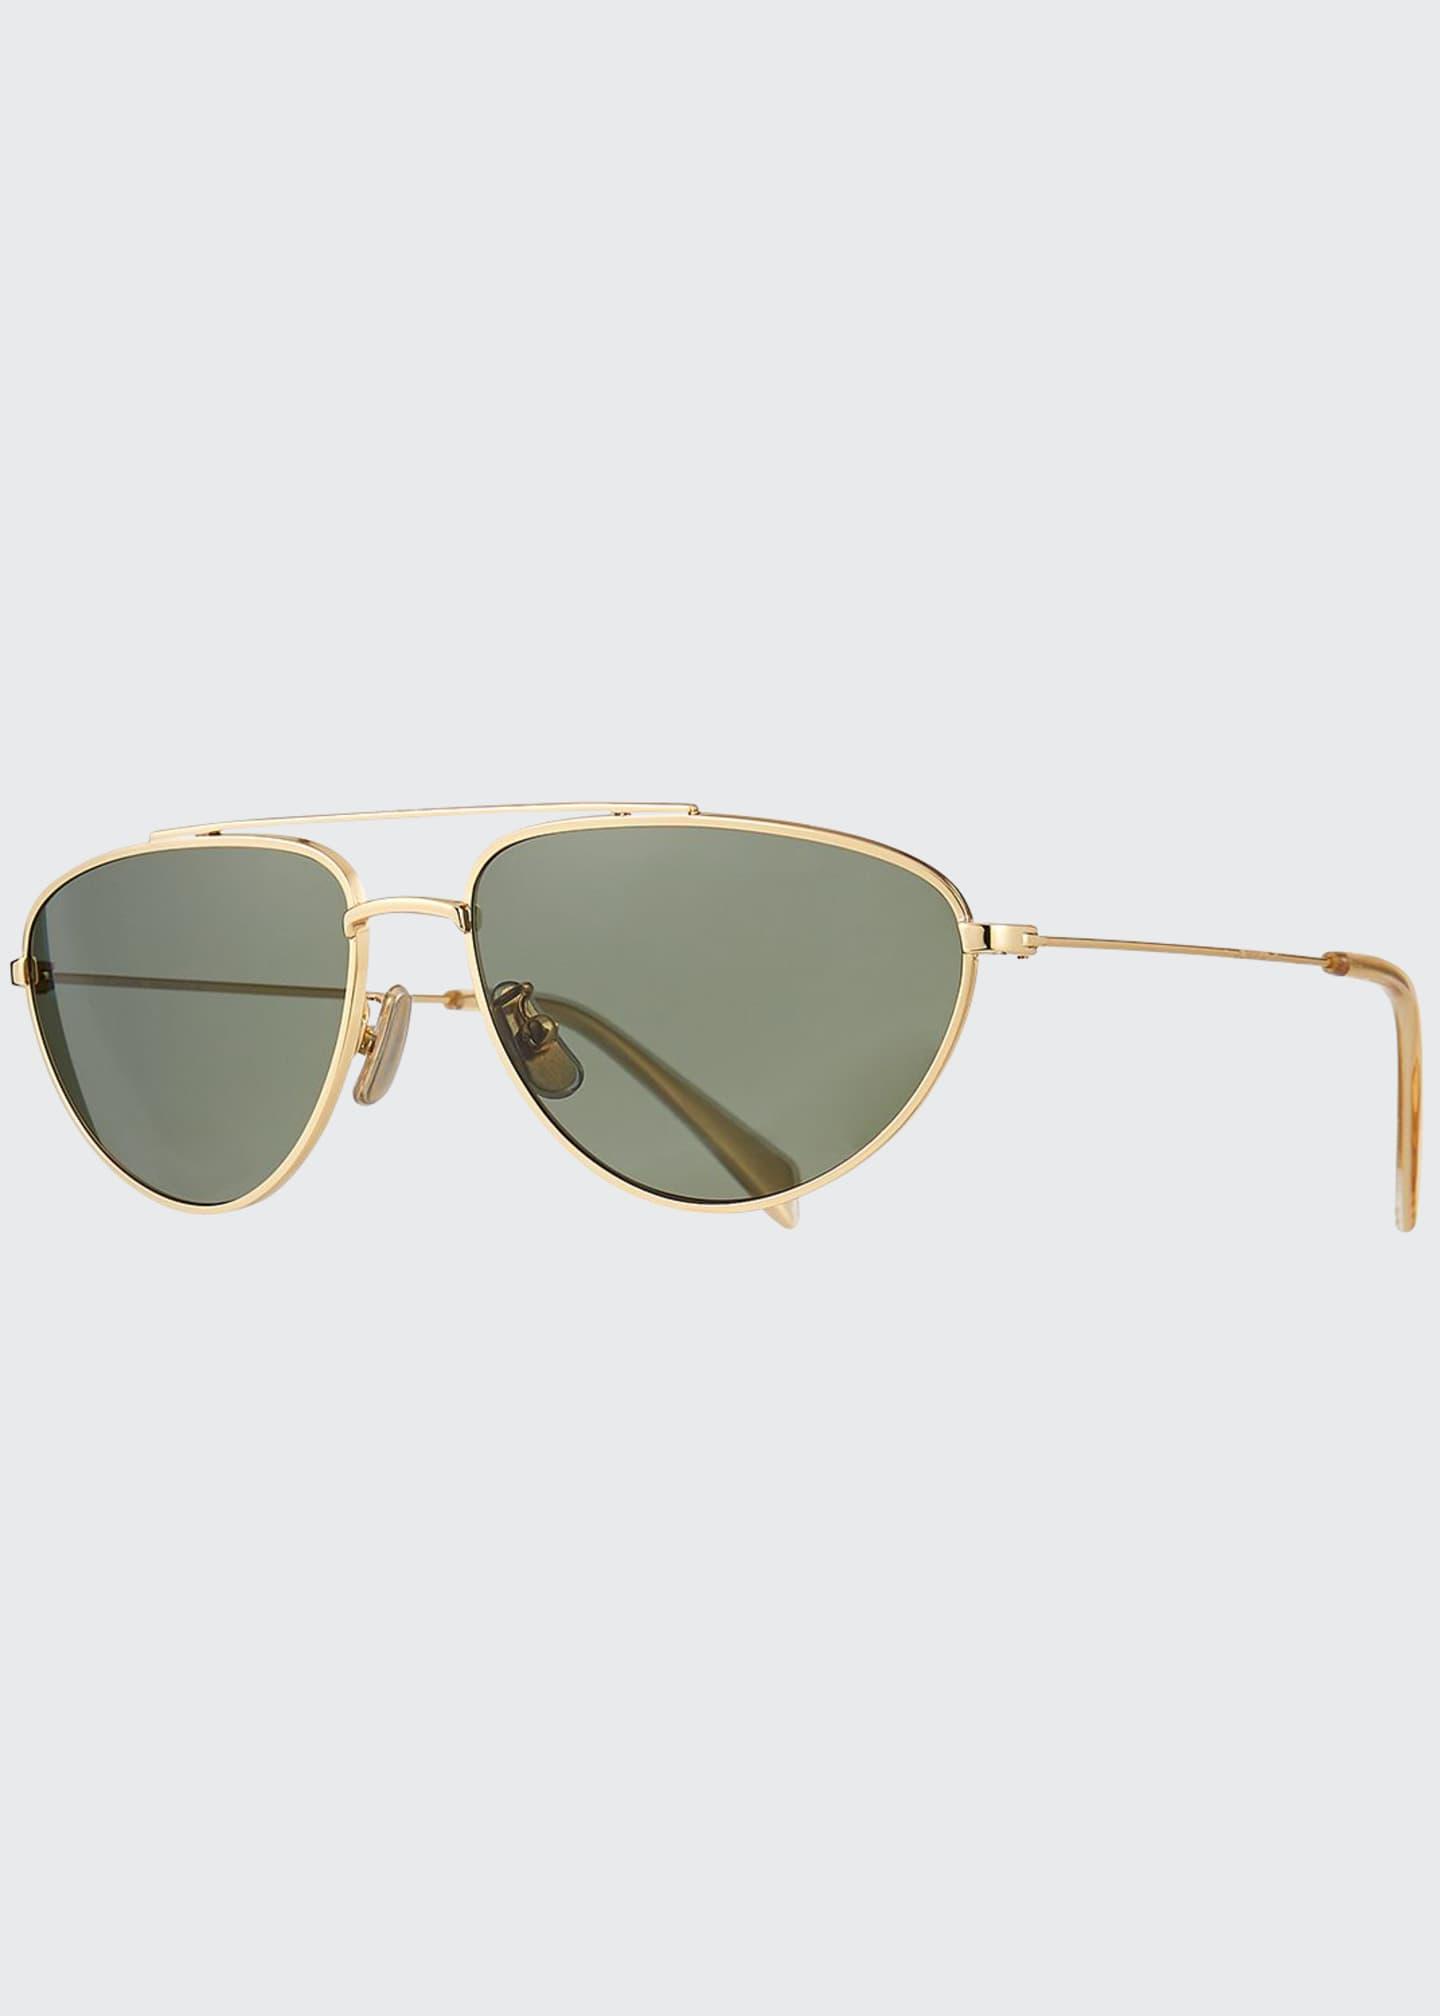 Celine Men's Metal Pilot Sunglasses, Gold